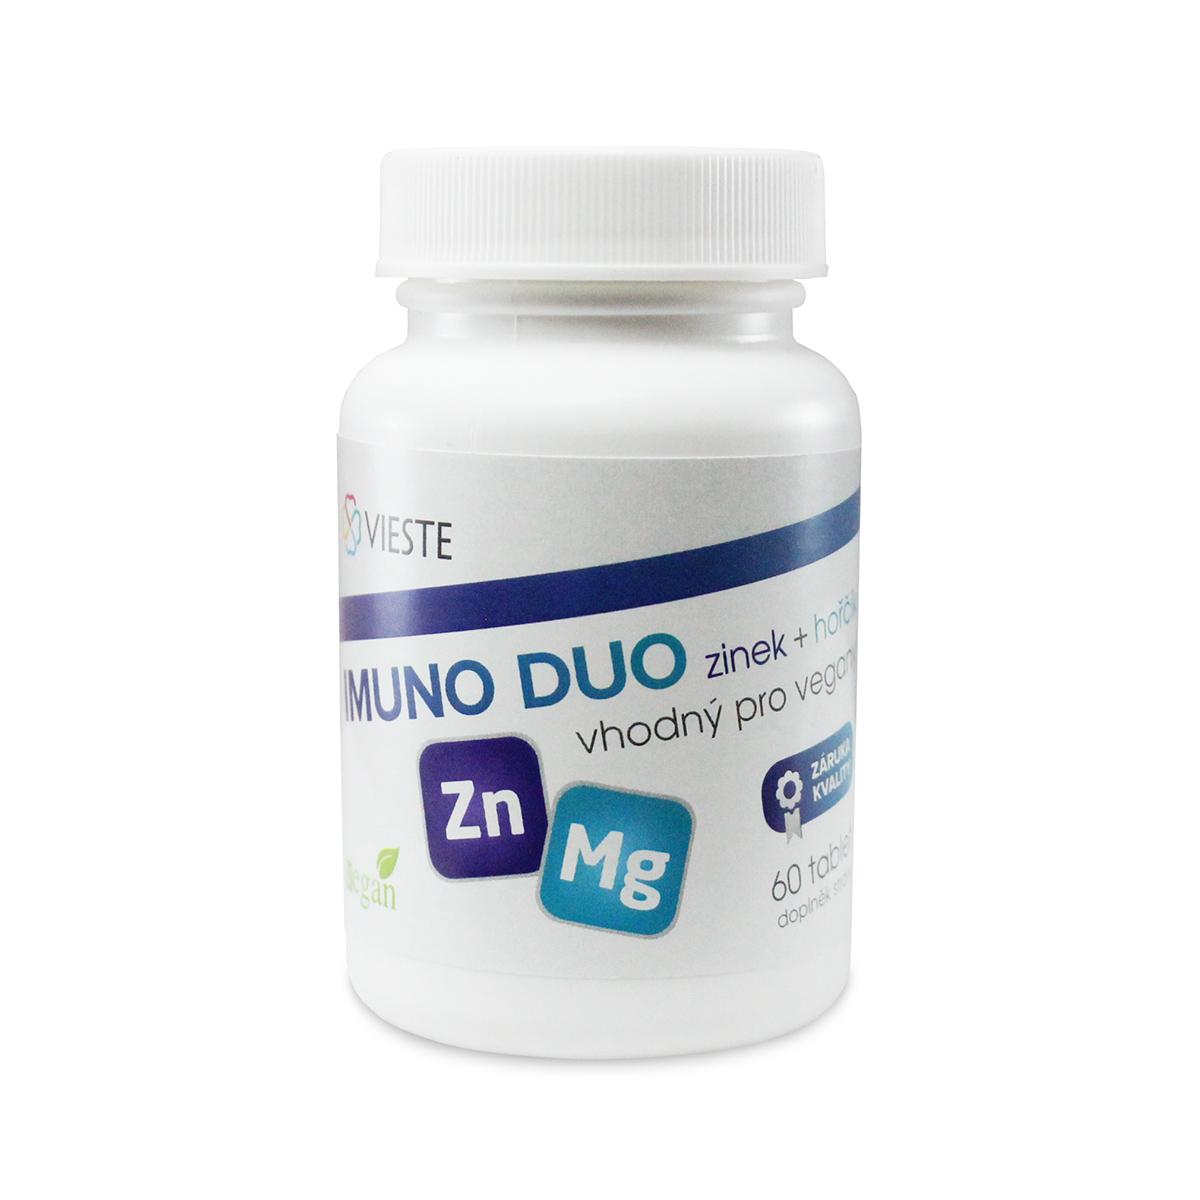 Vieste Imuno Duo zinek + hořčík 60 tbl